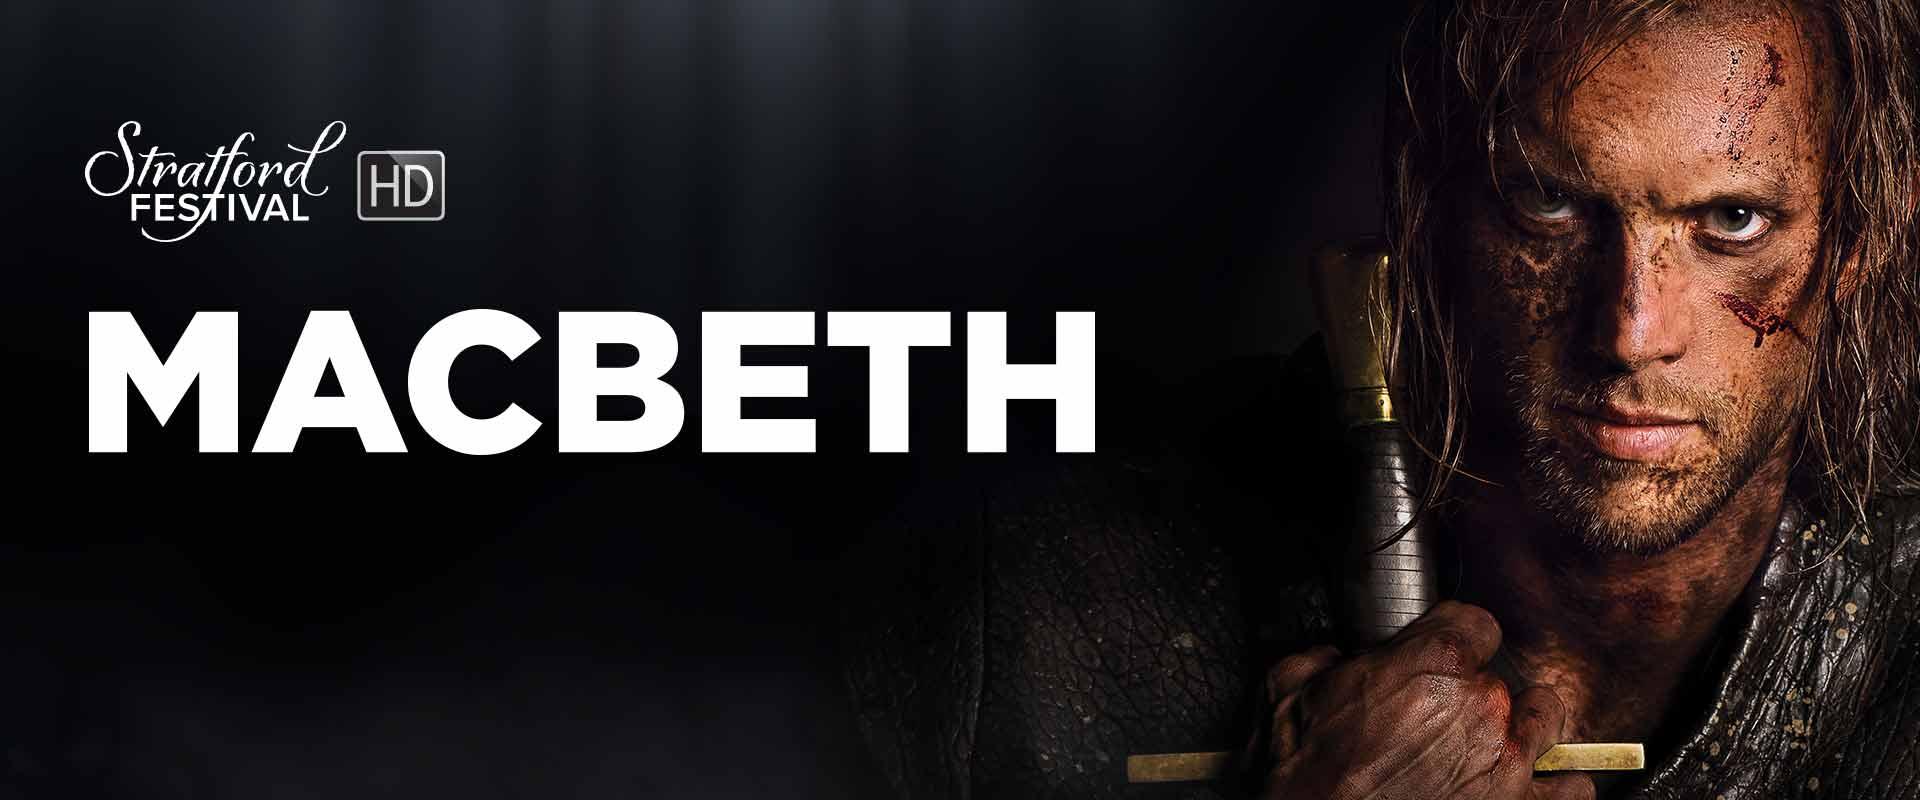 Macbeth hero image featuring Ian Lake